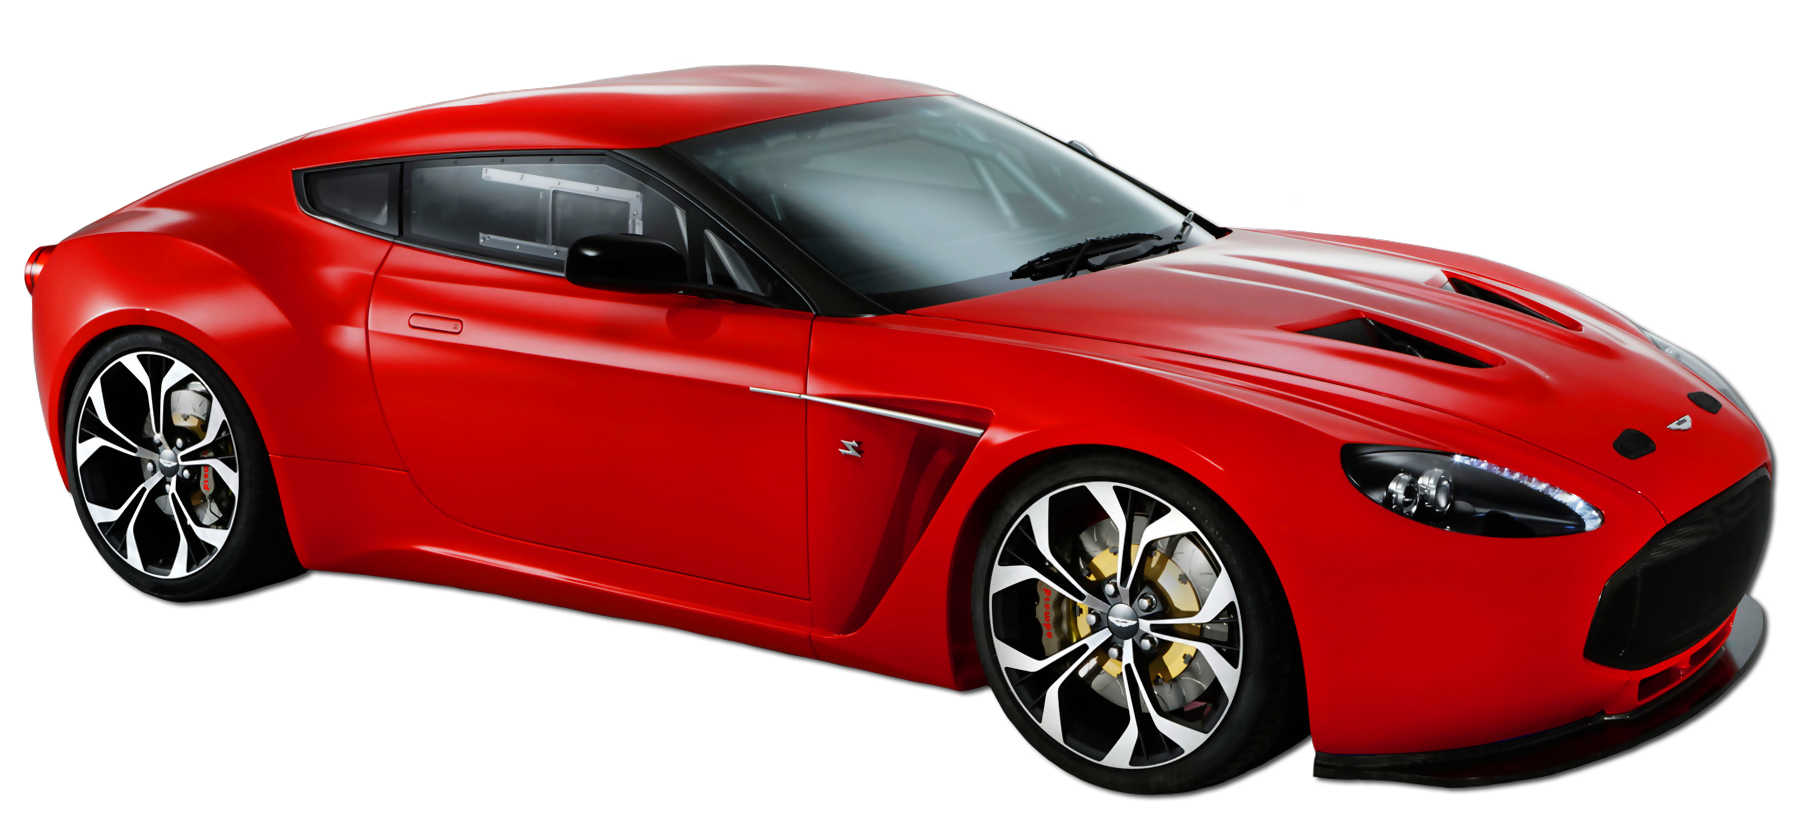 Aston Martin Car Png Car Clipart Best Web Clipart. - Aston Martin Auto Vector, Transparent background PNG HD thumbnail